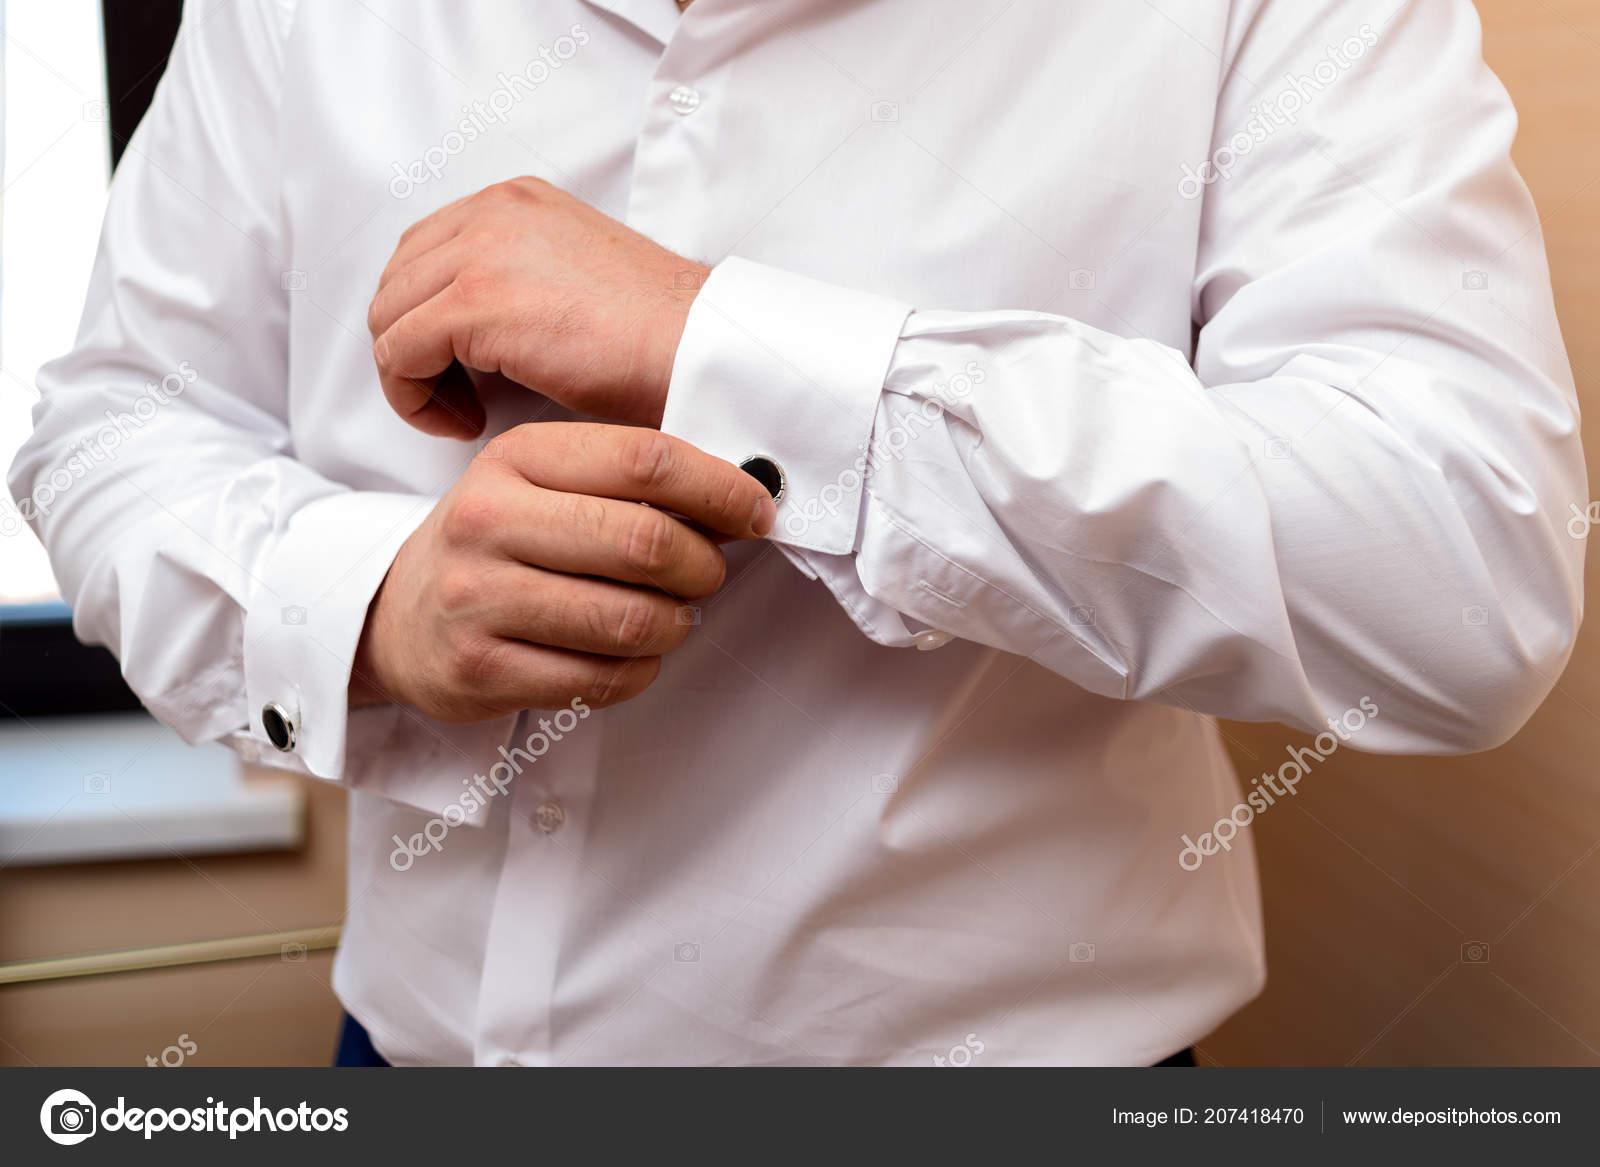 10d0dca9b1cc Άνθρωπος μανικετόκουμπο κουμπιά στις μανσέτες μανίκια πολυτελή λευκό  πουκάμισο. Κοντινό πλάνο της άνθρωπος χέρι φοράει λευκό πουκάμισο και  μανικετόκουμπα.